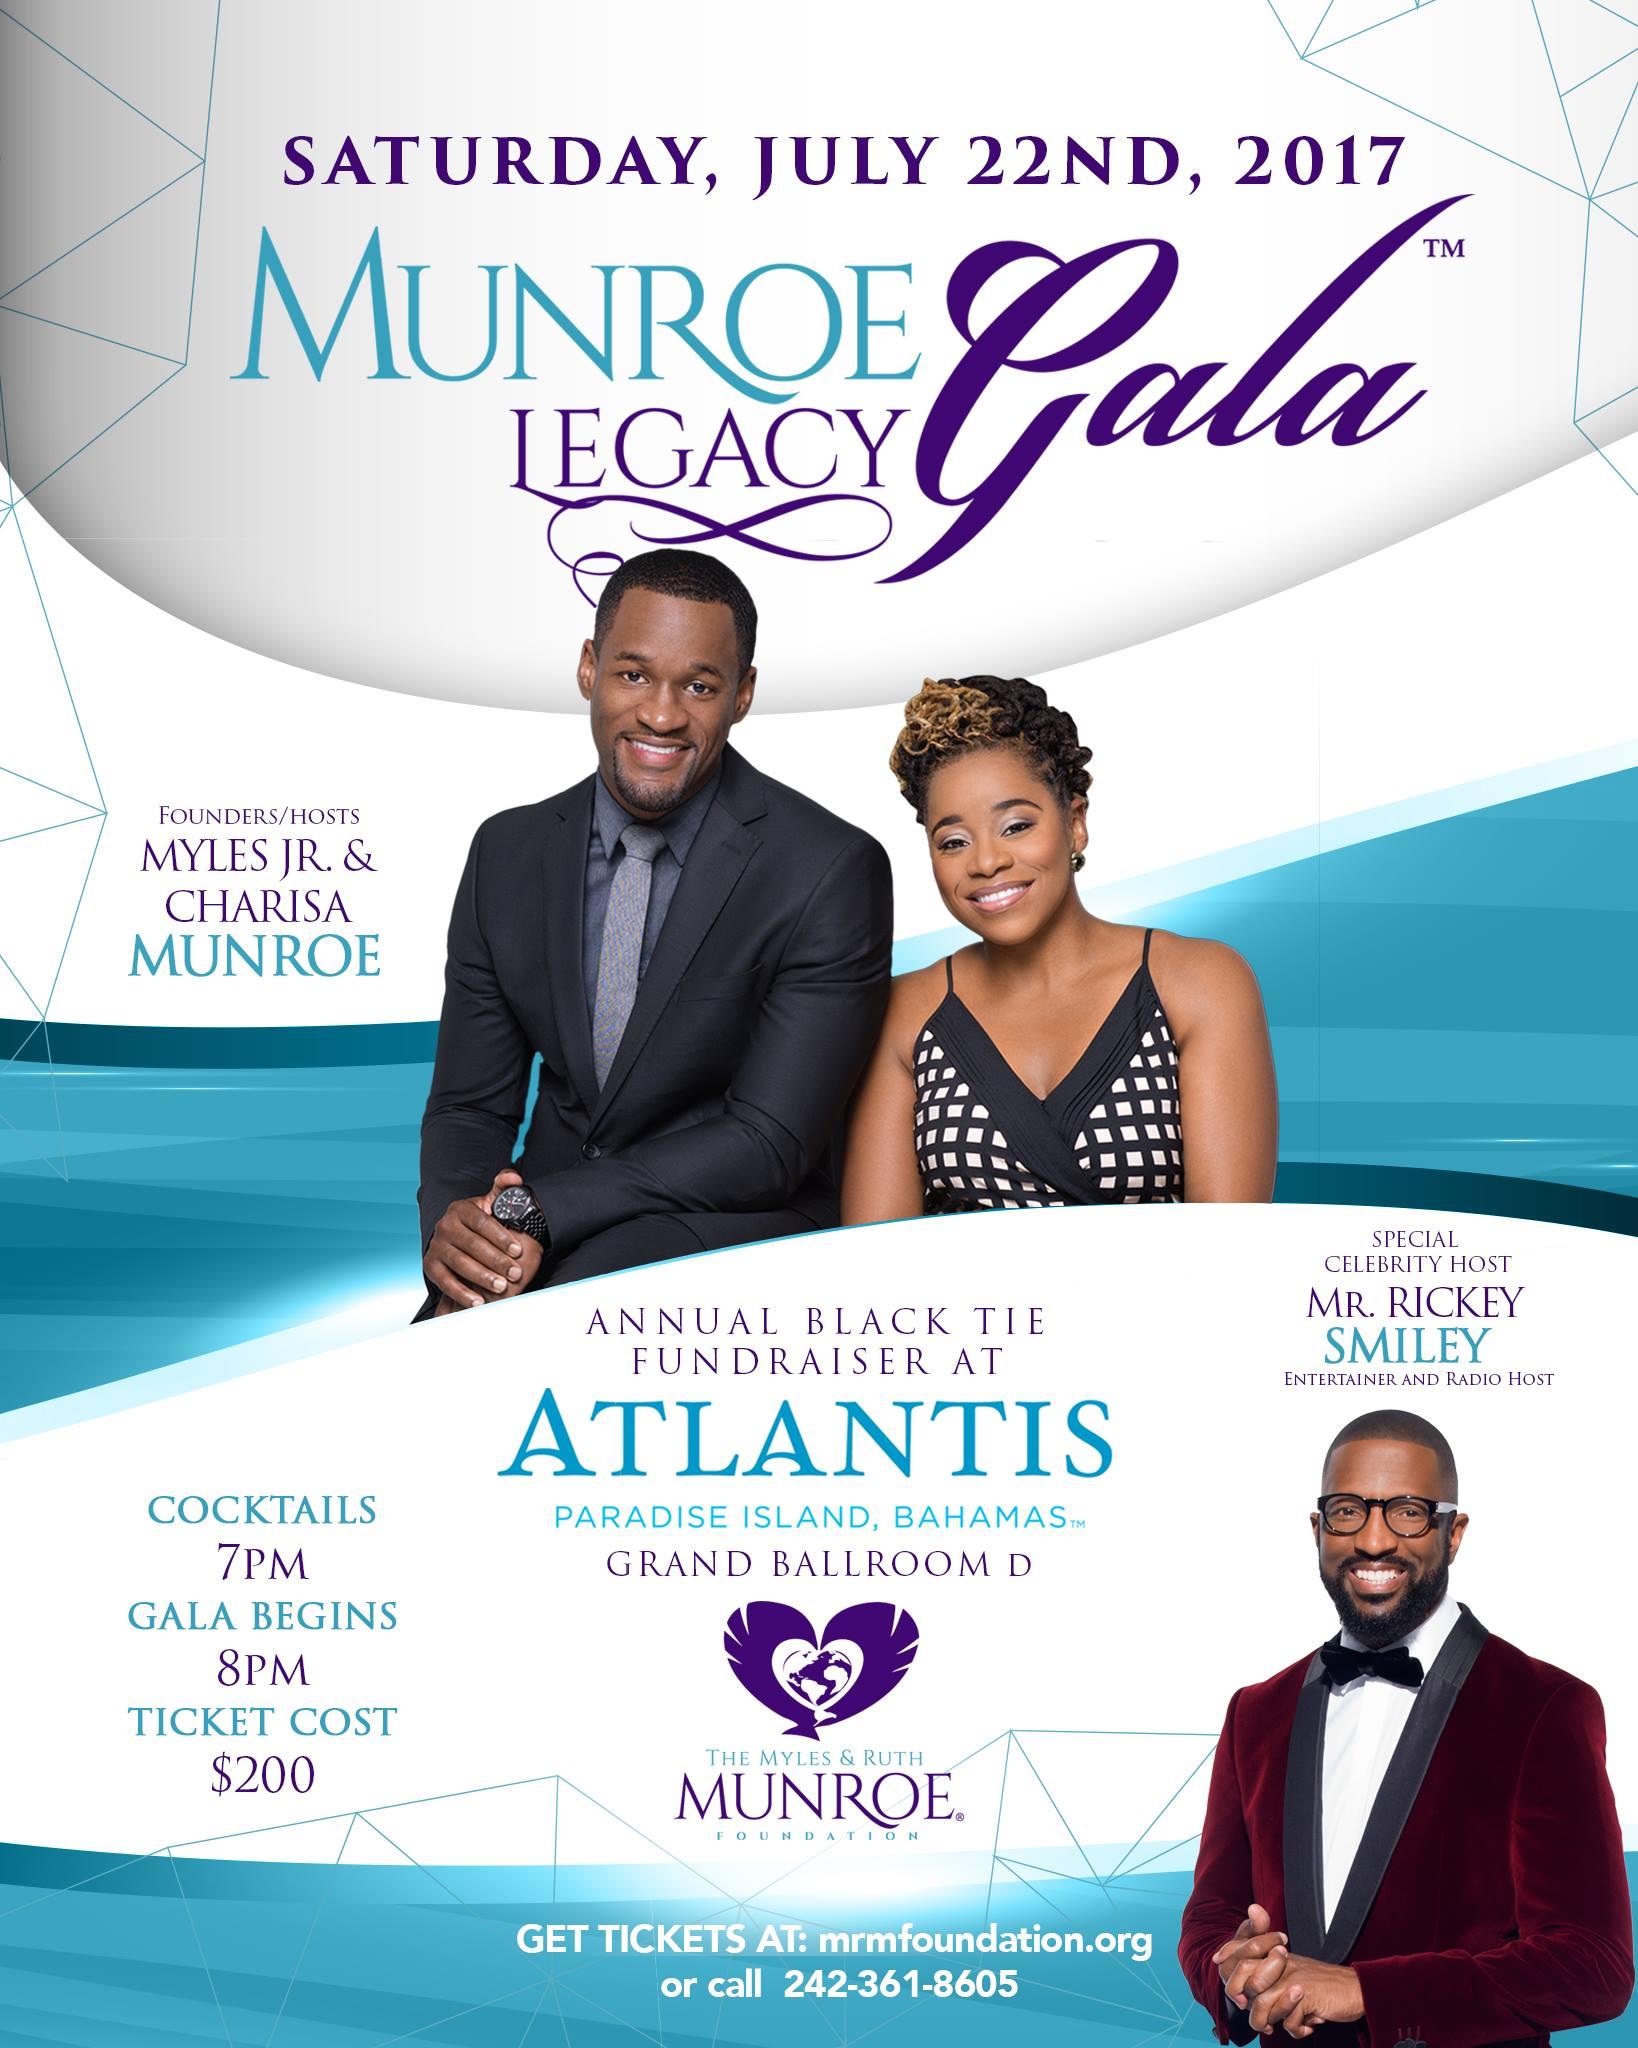 Munroe Legacy Gala